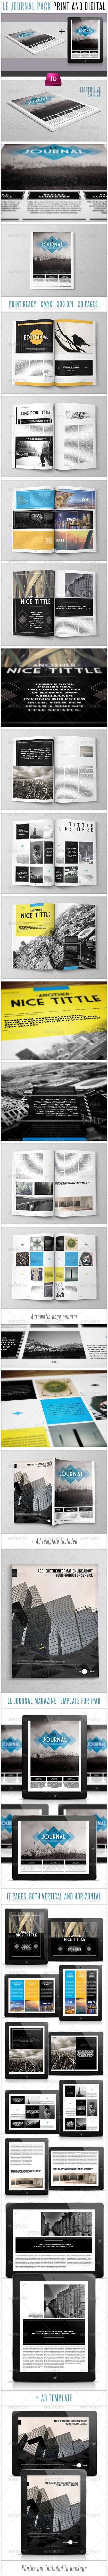 GraphicRiver Le Journal MGZ Print & Digital 5327501